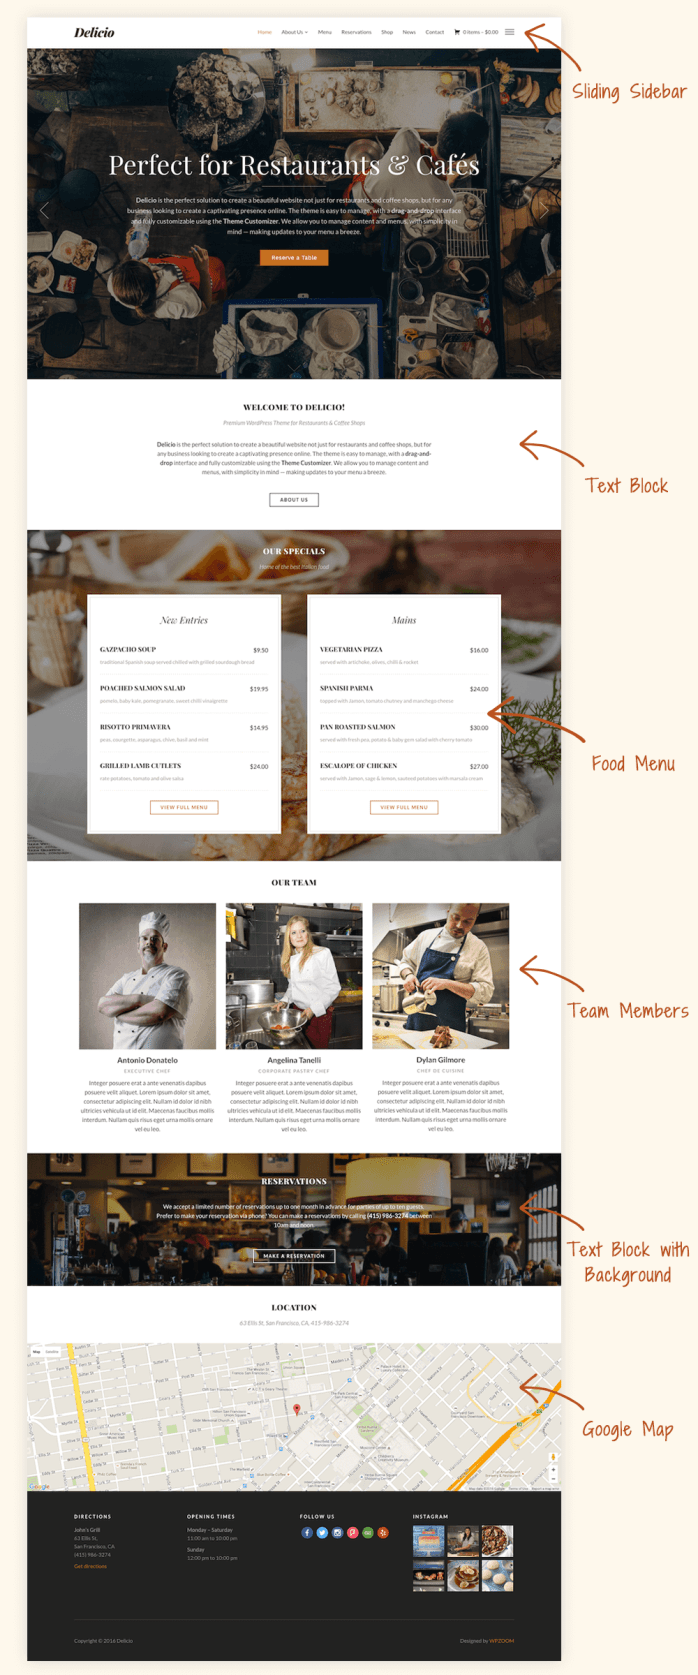 The Delicio restaurant WordPress theme